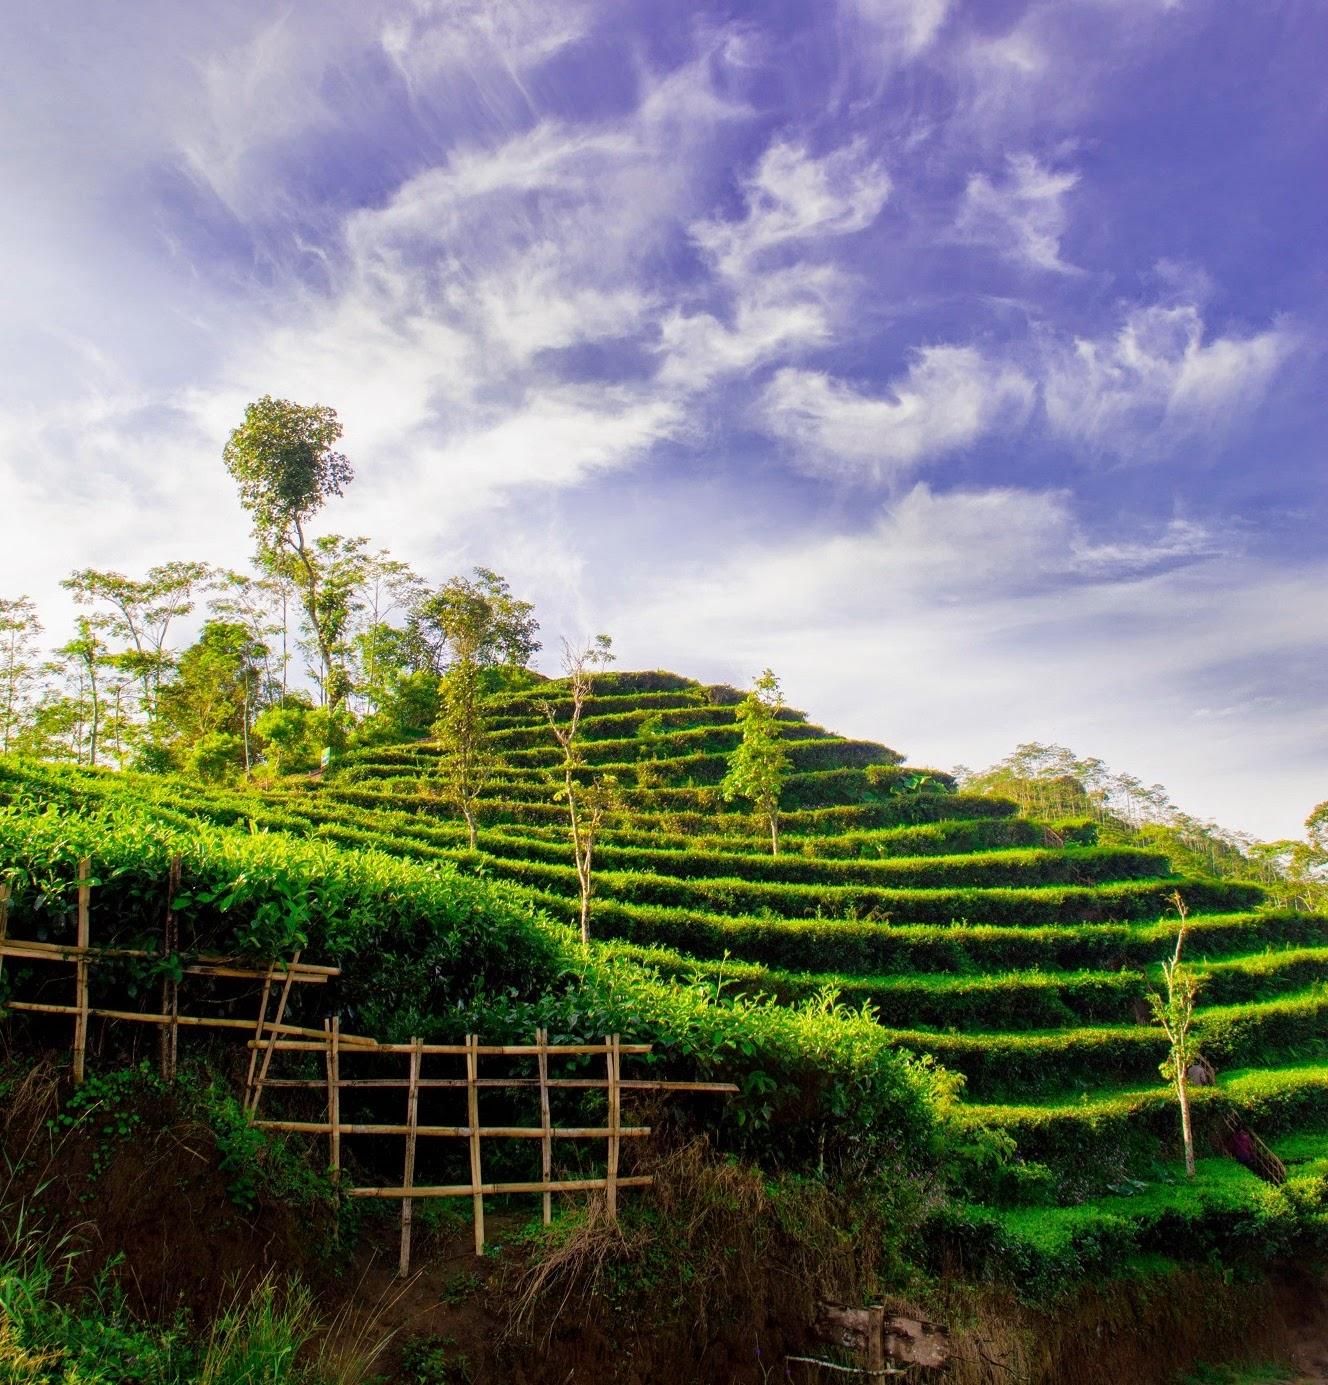 Kebun Teh Nglinggo Satu Satunya Jogja Onenesia Kota Yogyakarta